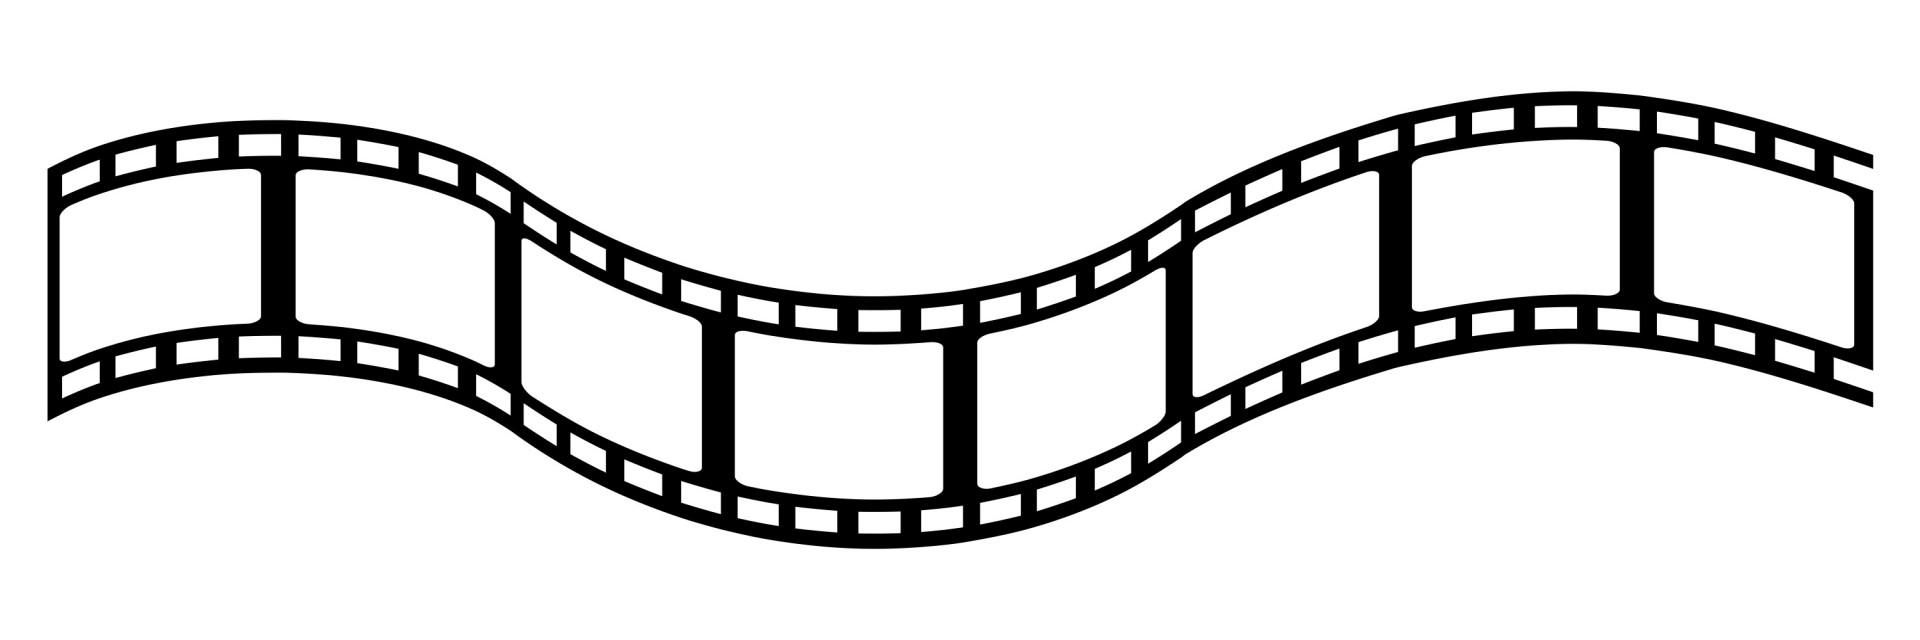 1920x640 Film Strip Filmstrip Clipart Getbellhop